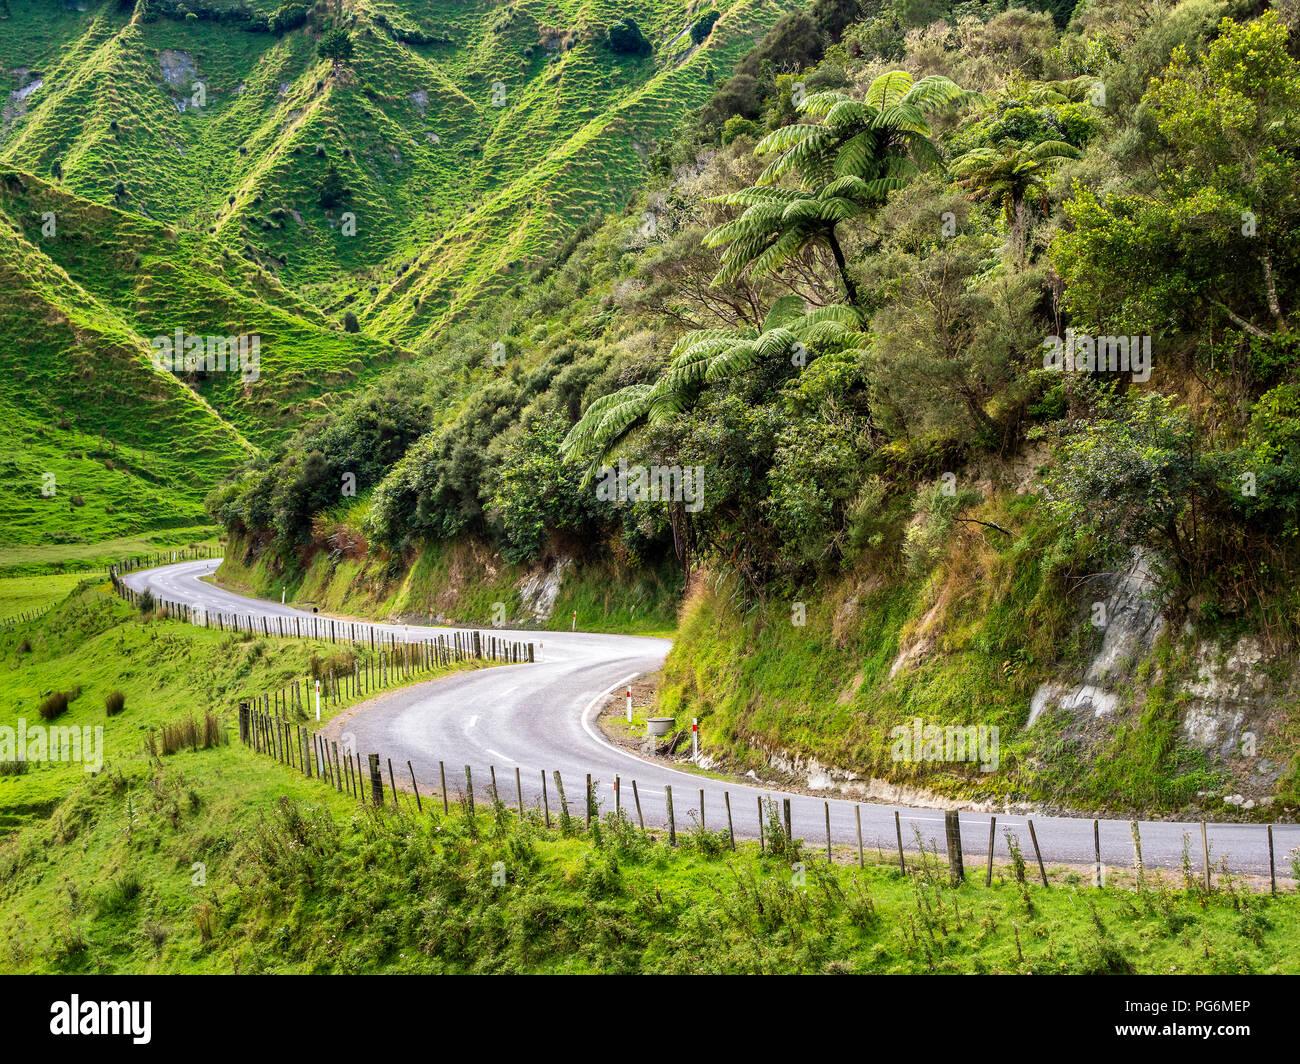 New Zealand, North Island, Manawatu-Wanganui Region, Forgotten World Highway - Stock Image